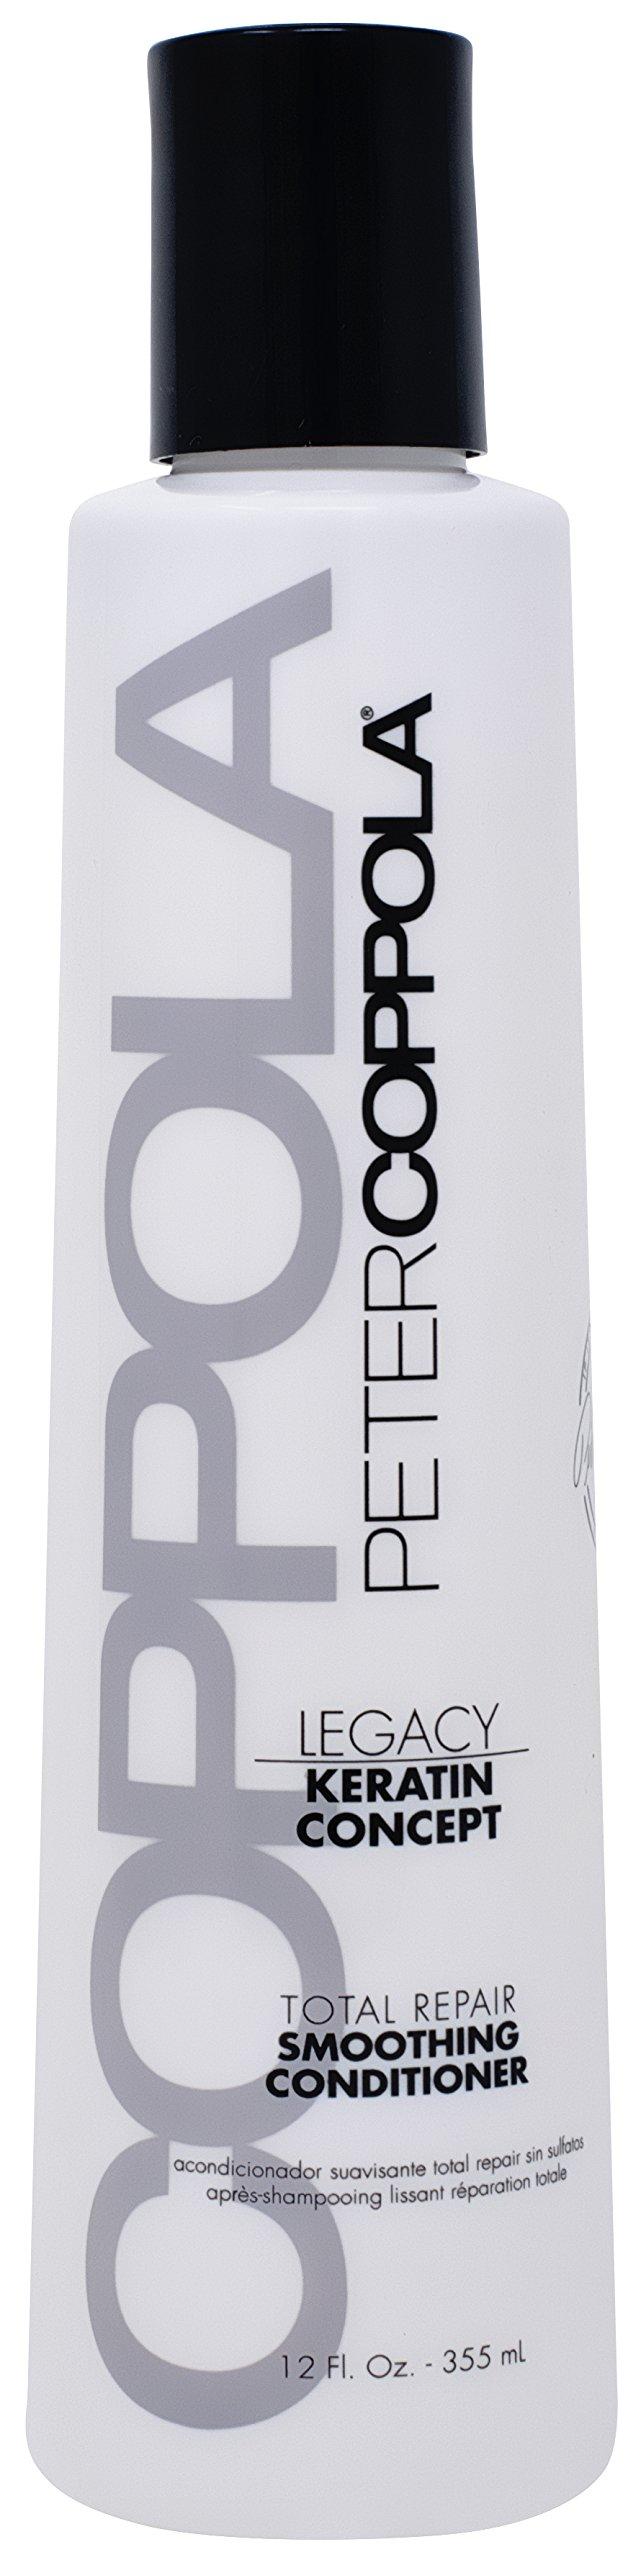 Peter Coppola Legacy Total Repair Conditioner - Keratin Protein, Anti Frizz Repairing, Color Safe